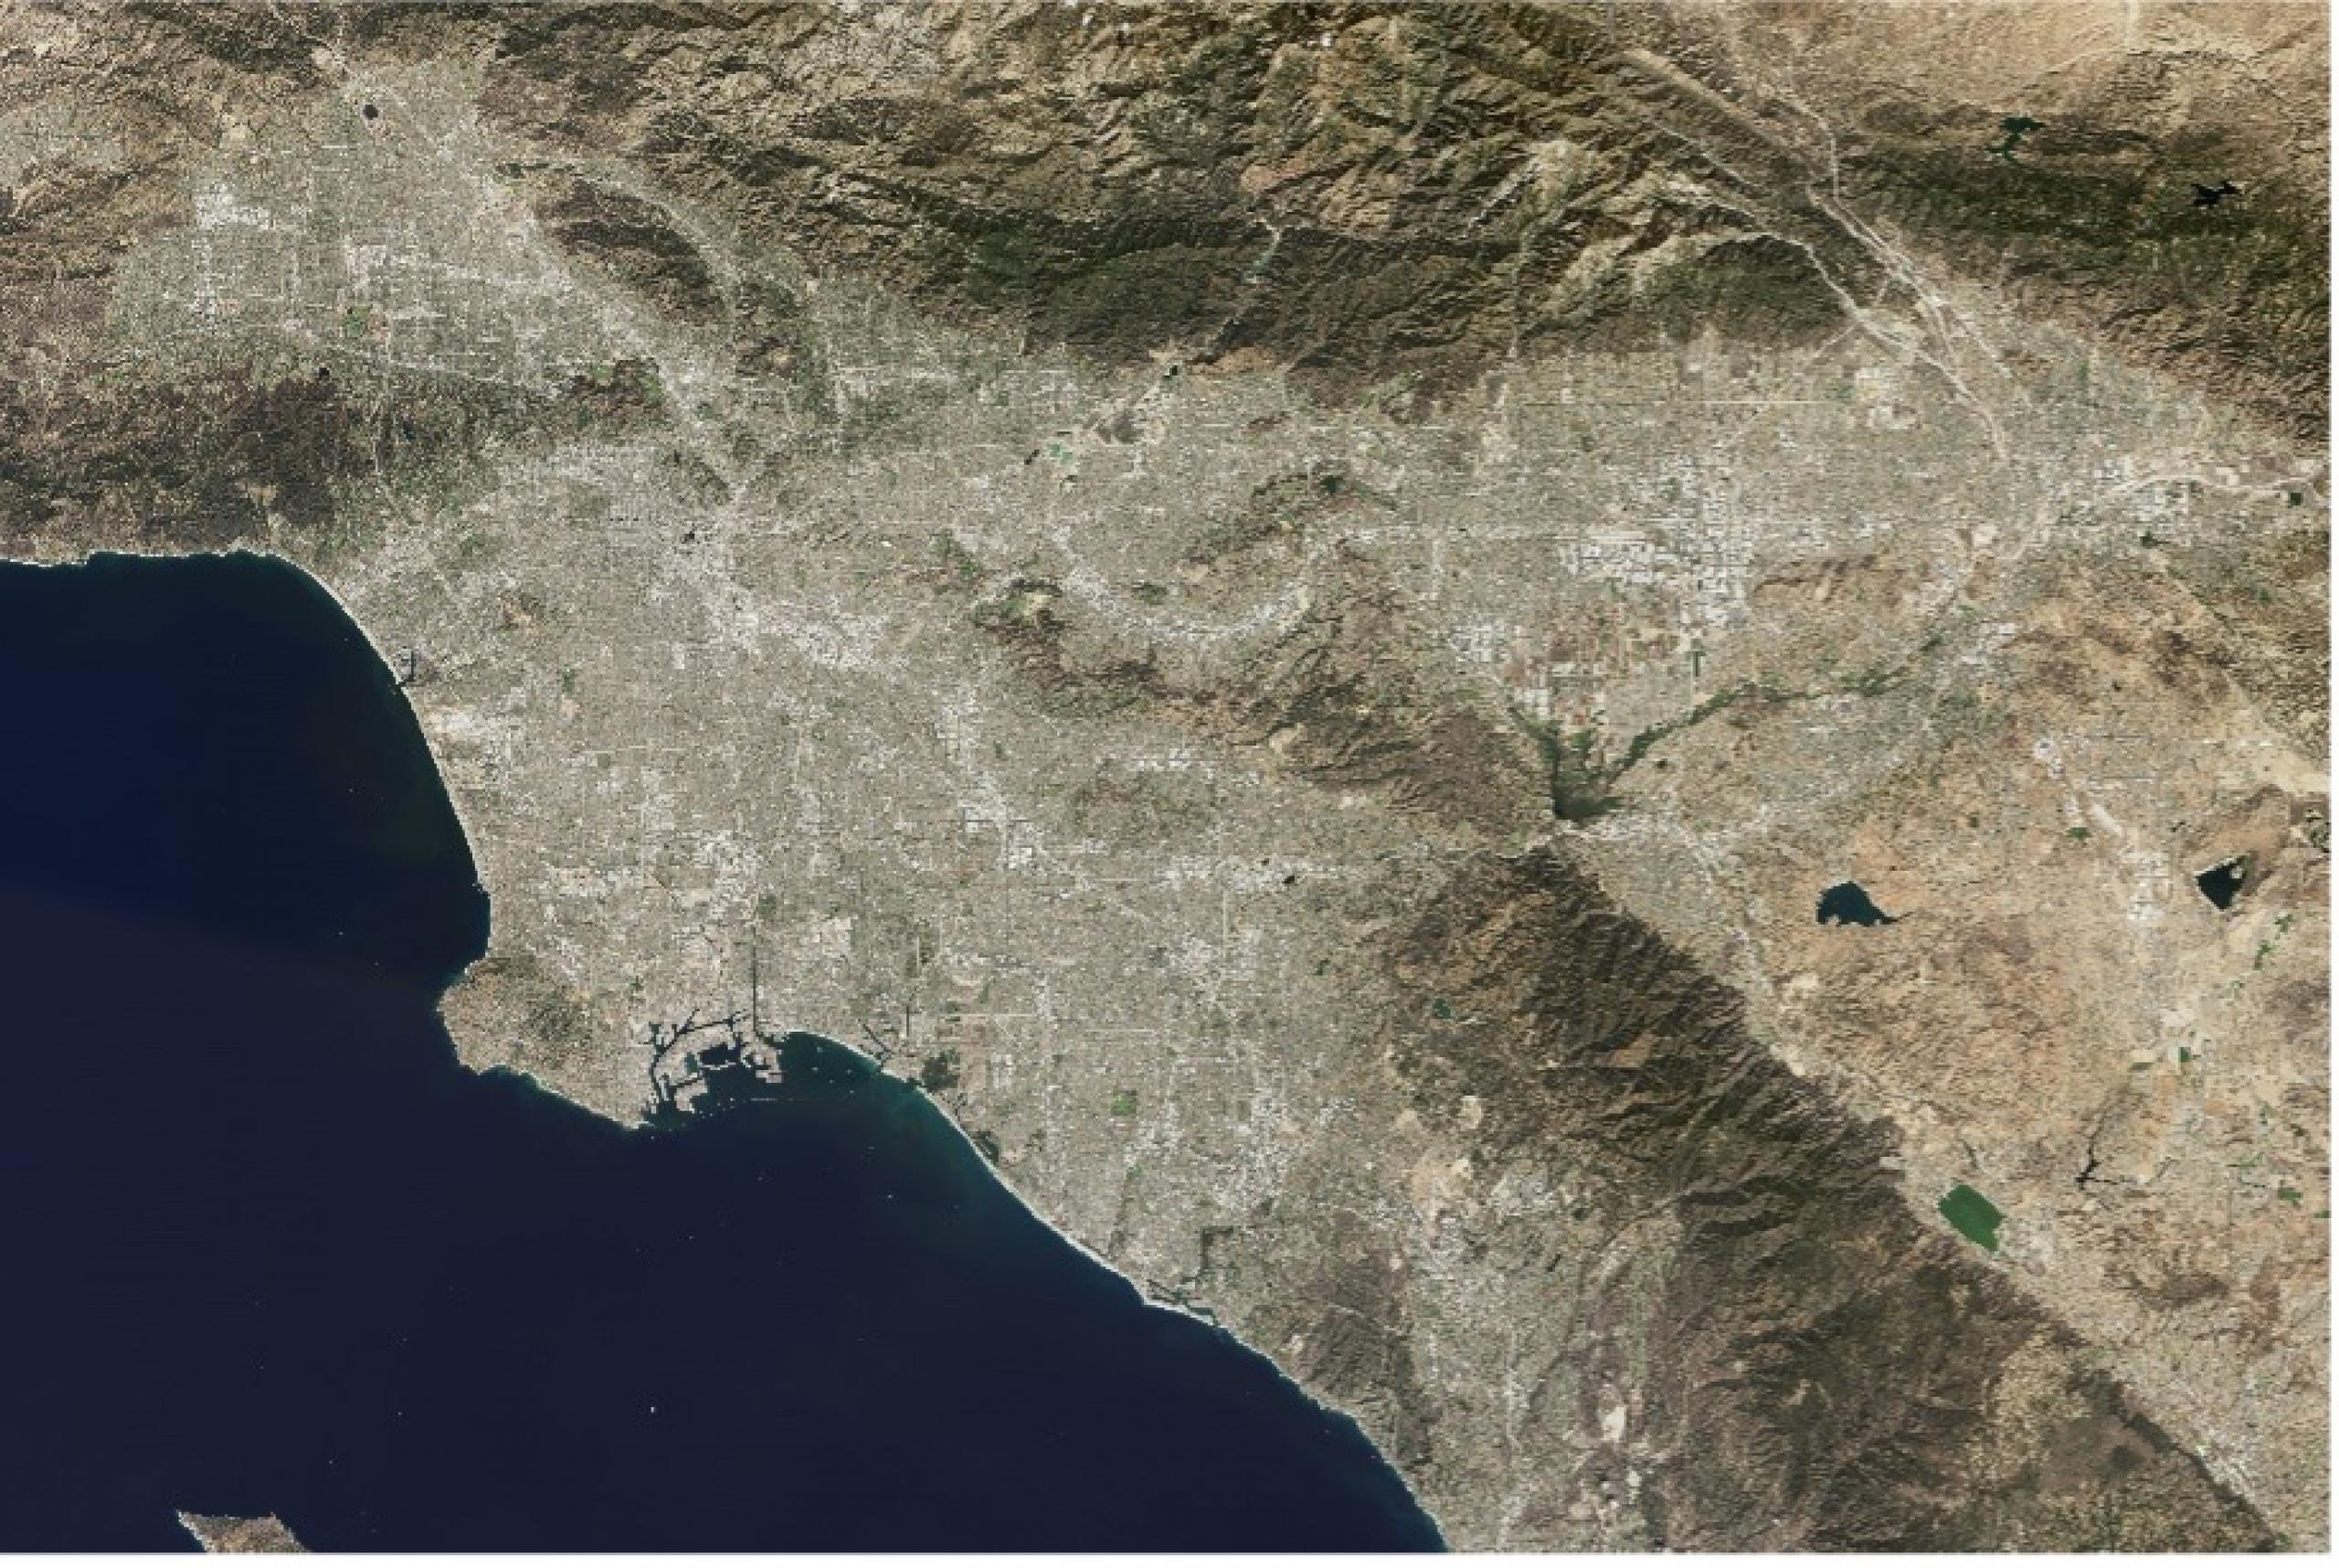 Landsat satellite image of the LA region.